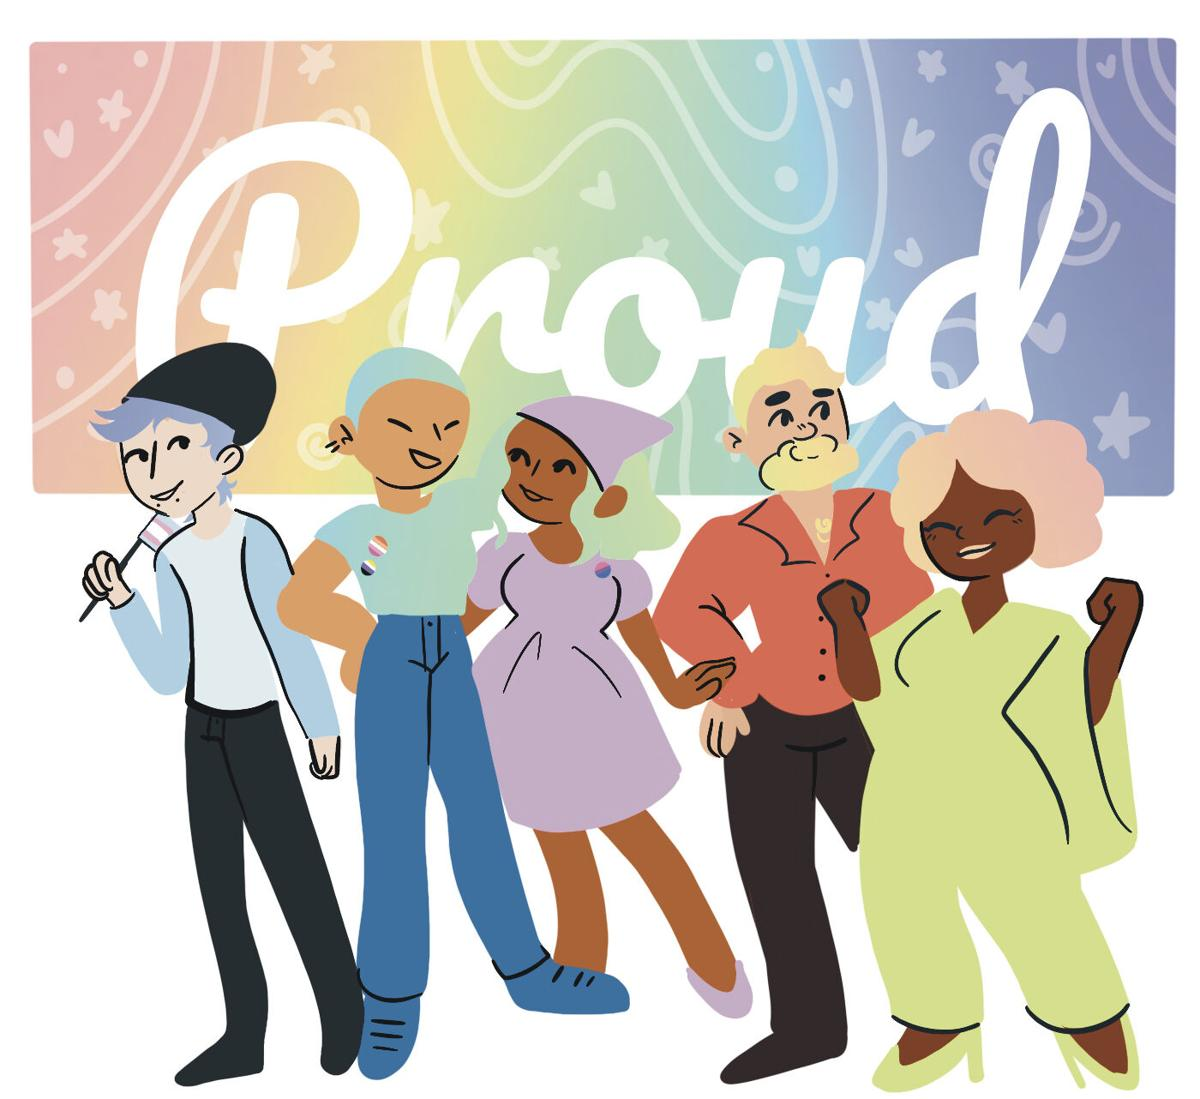 Opinion: LGBTQ+ representation is a must in modern children's media